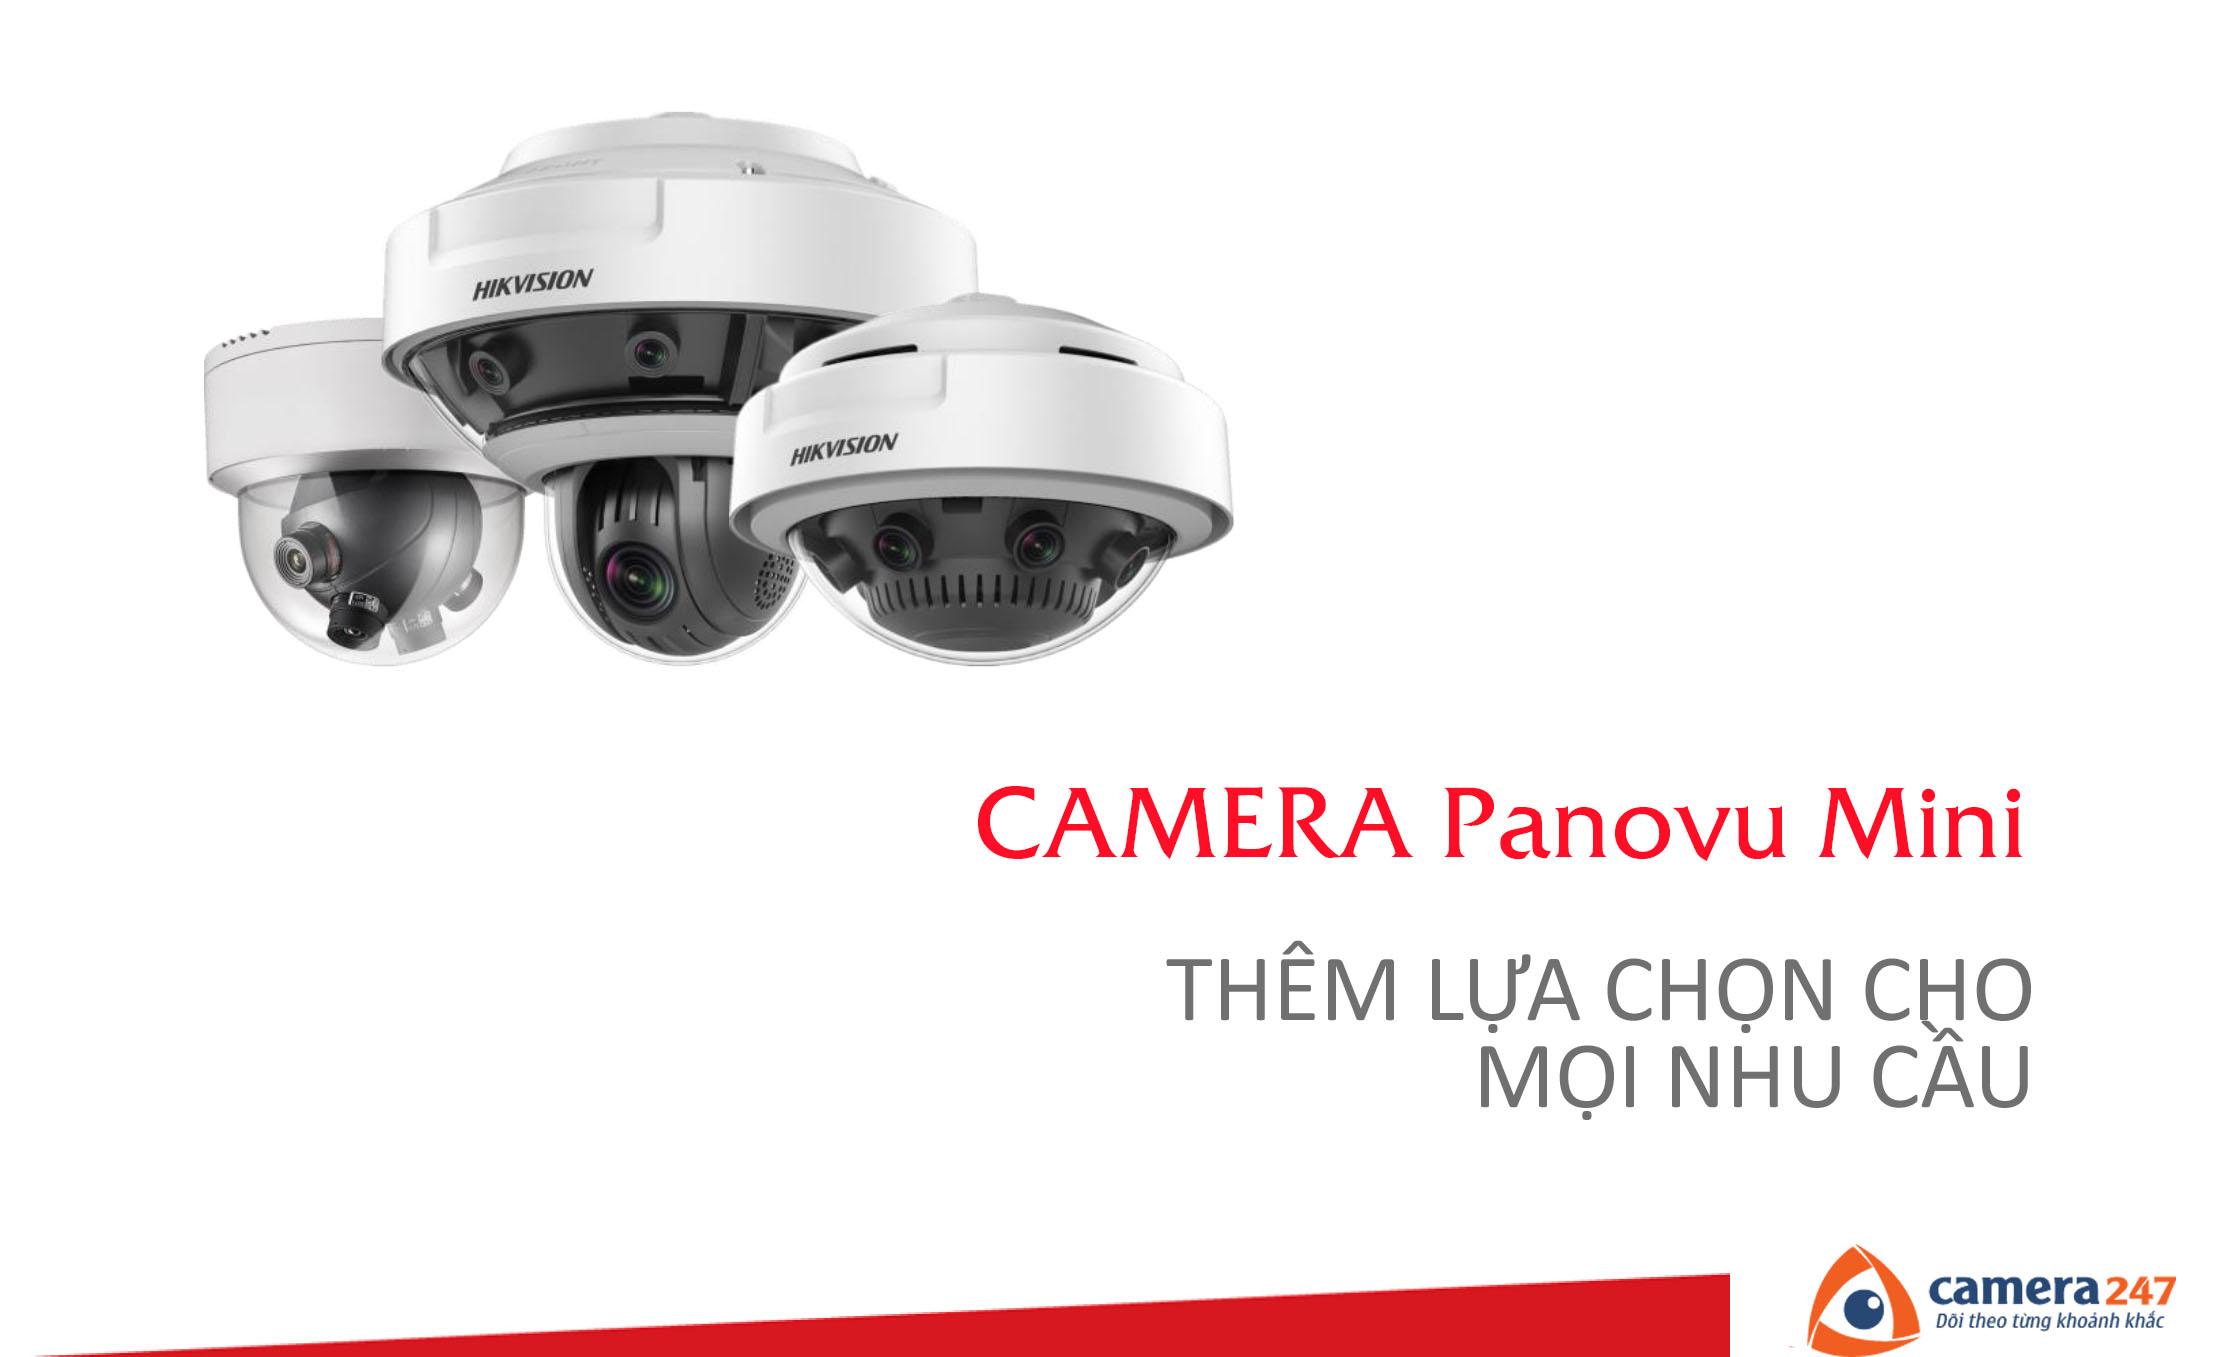 Hikvision Mini Panovu cú đột phá mới